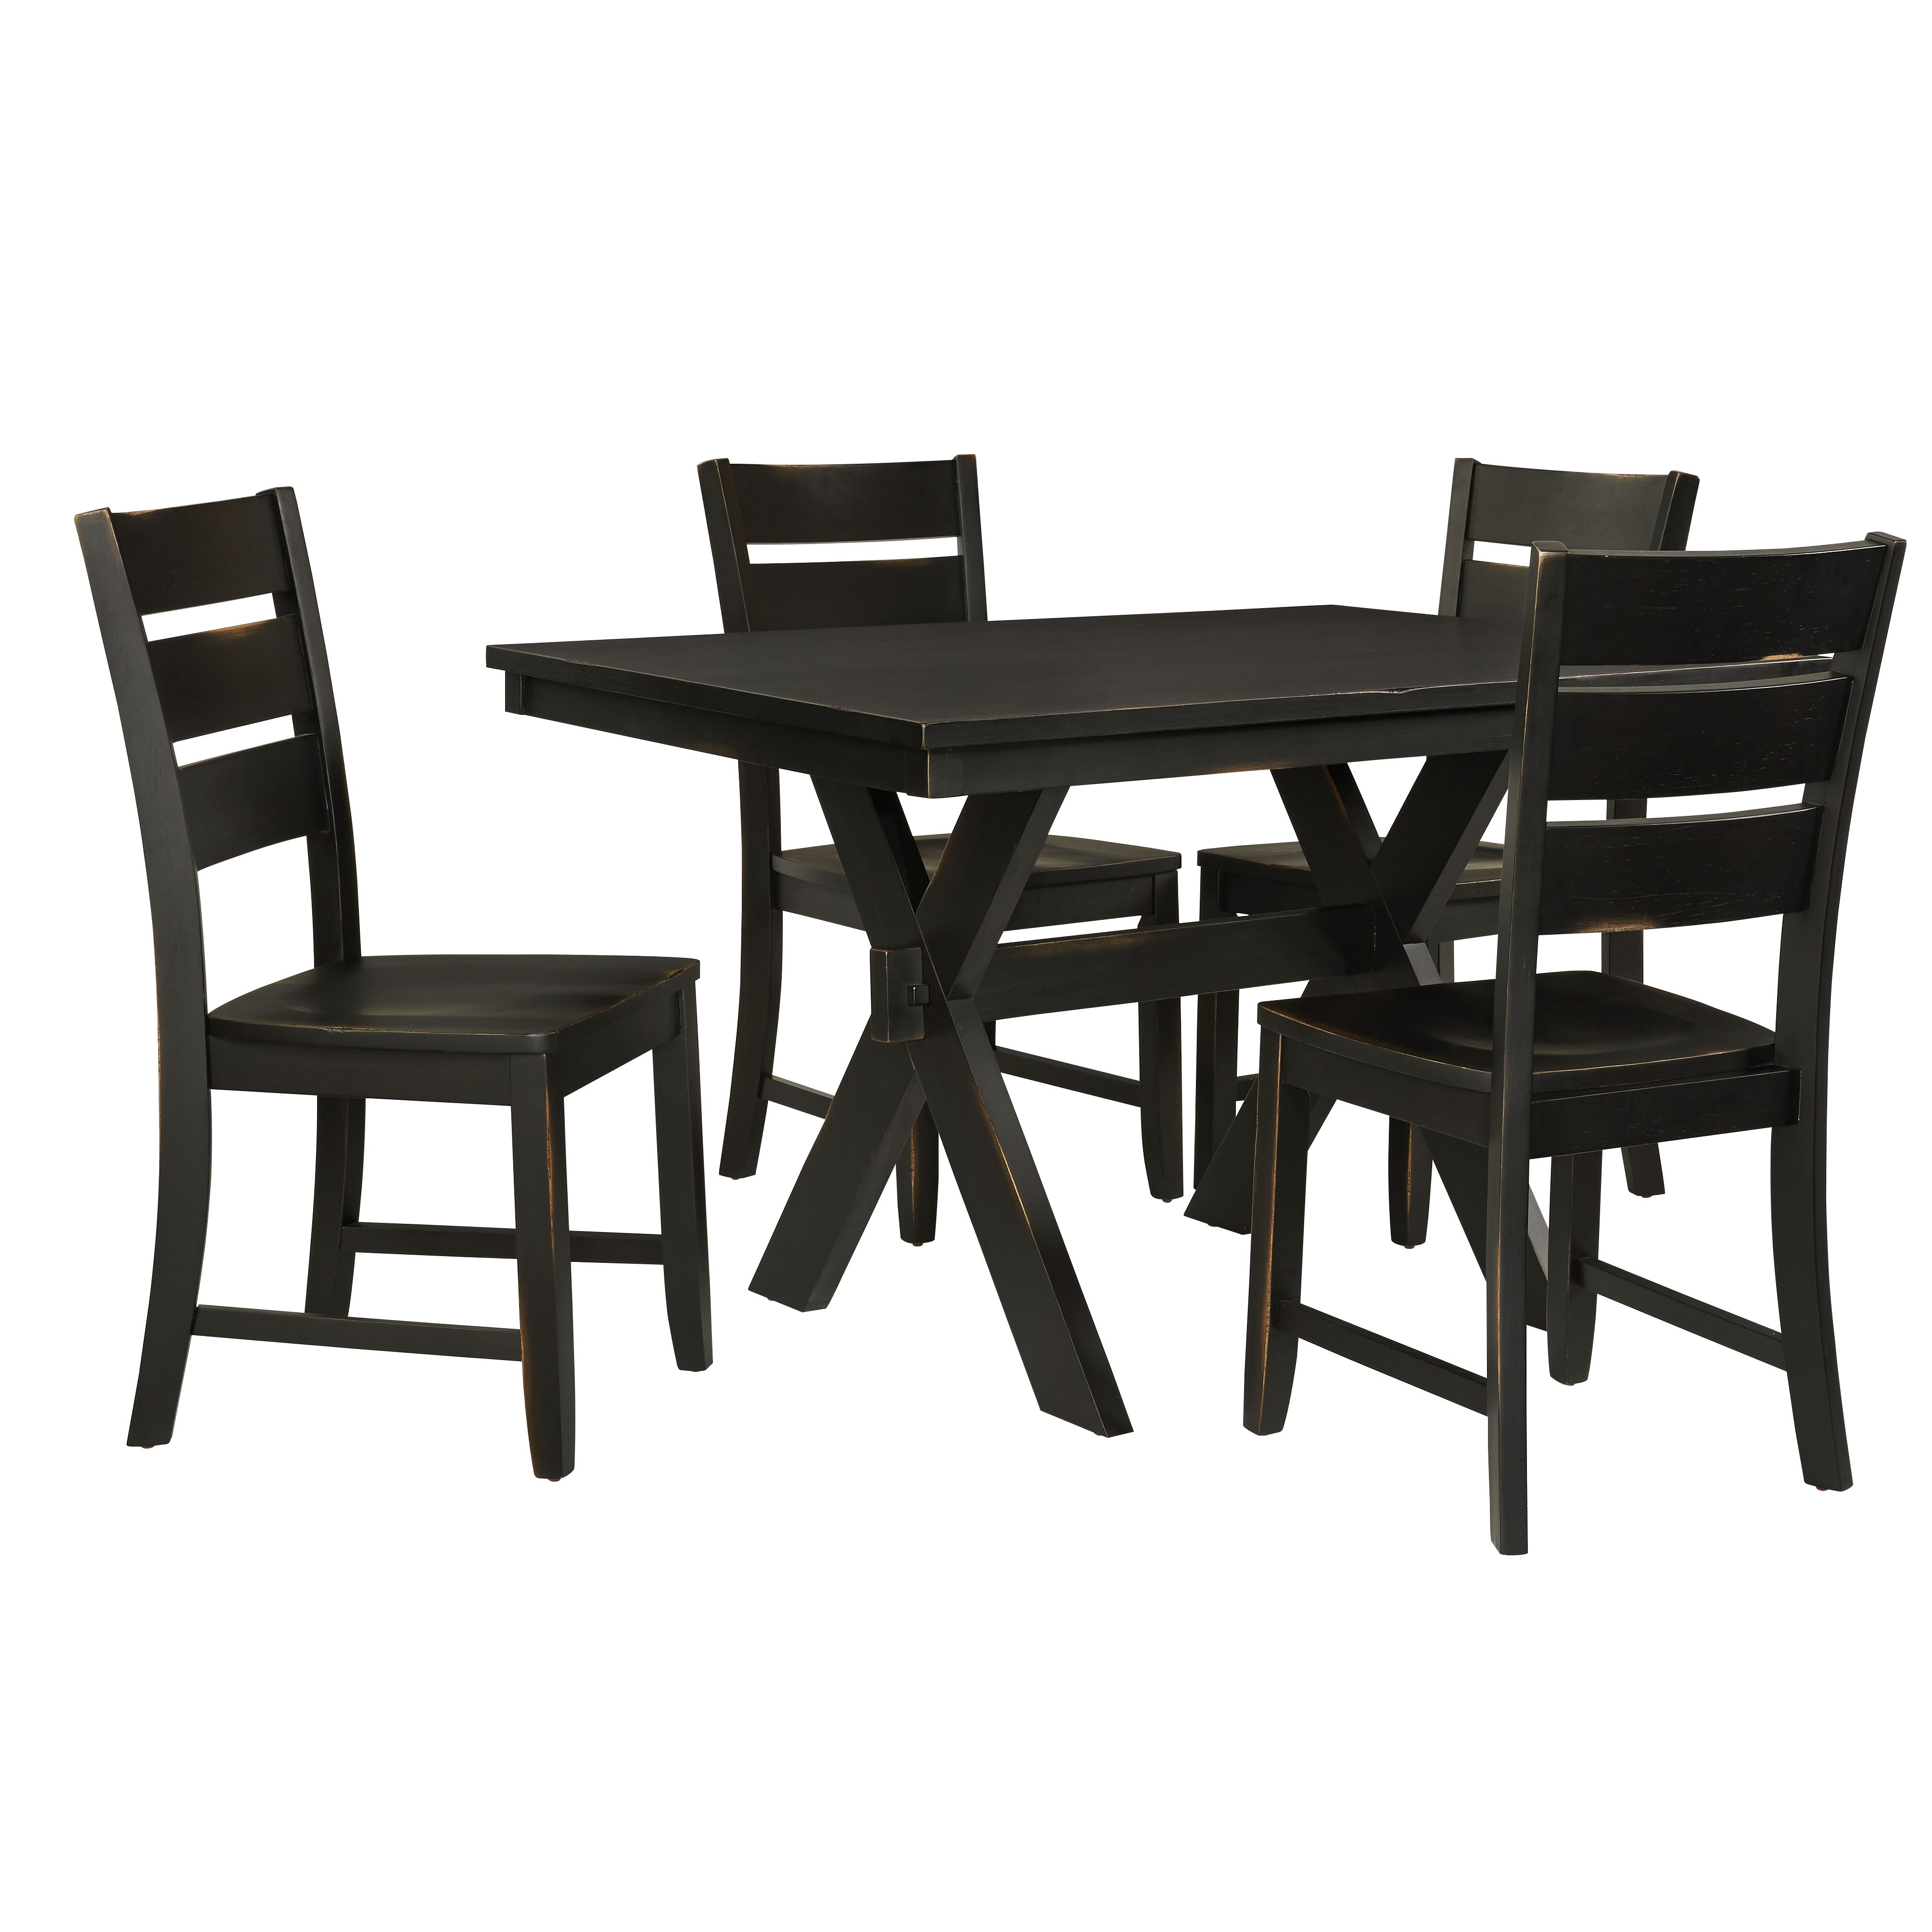 Standard furniture costa 5 piece dining set wayfair for 5 piece dining set